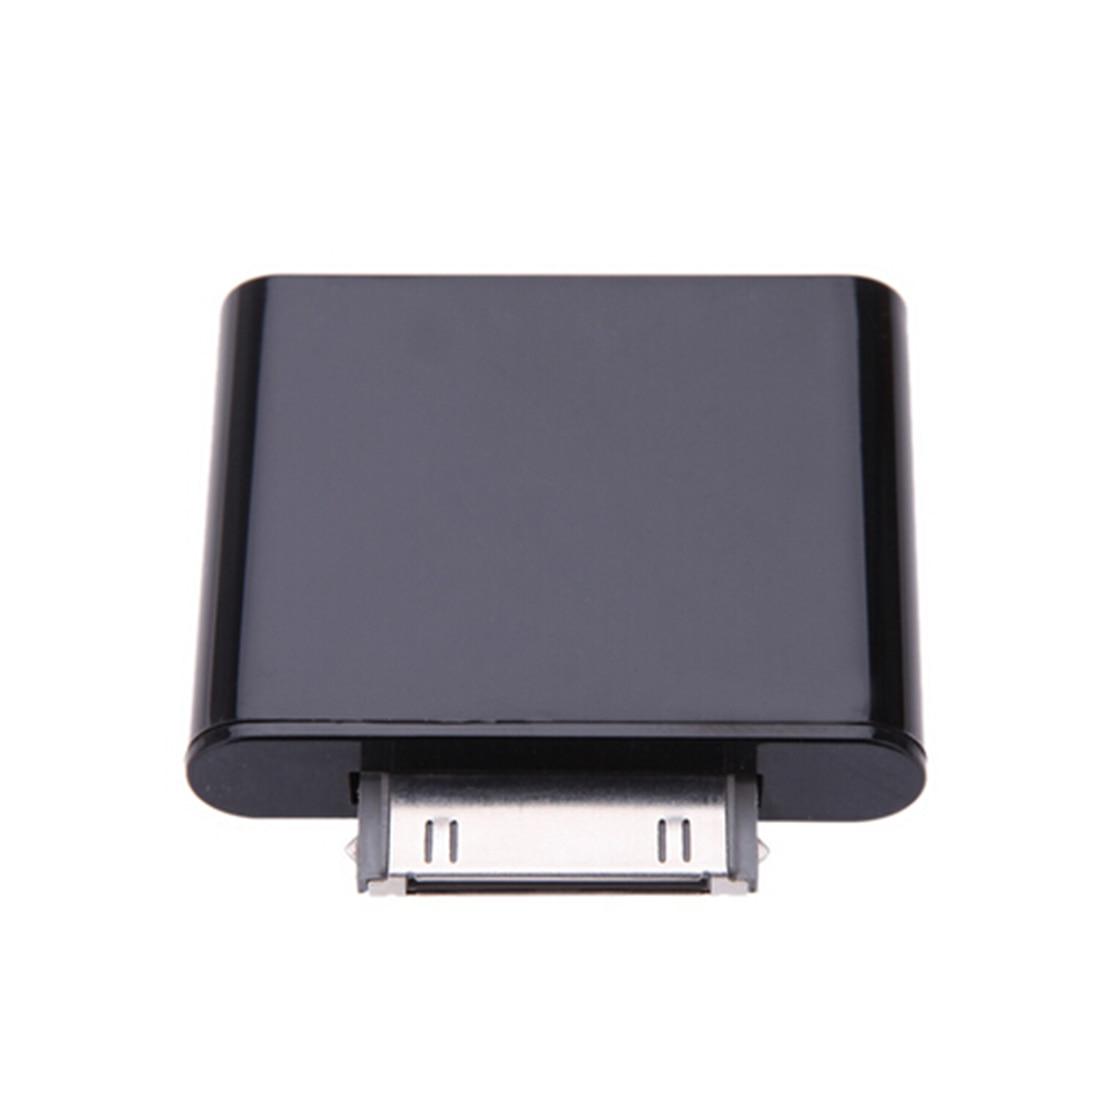 Bluetooth Adapter Audio Dongle Transmitter for iPod Mini iPod Classic iPod